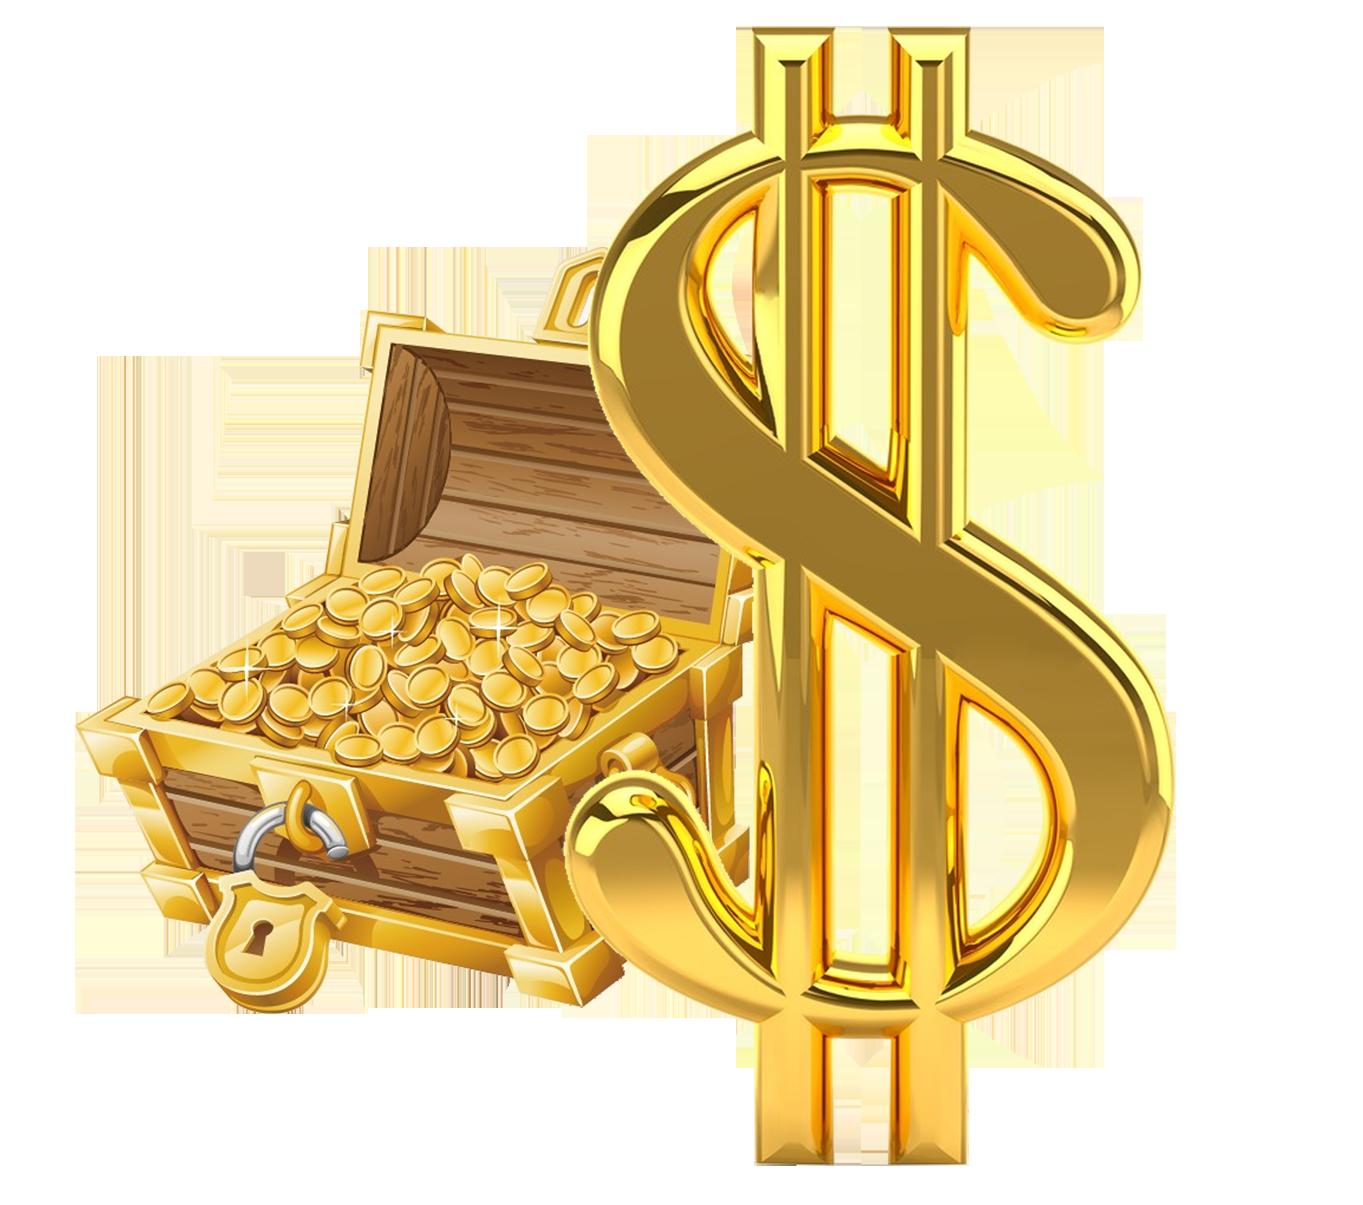 Gold money symbol clipart